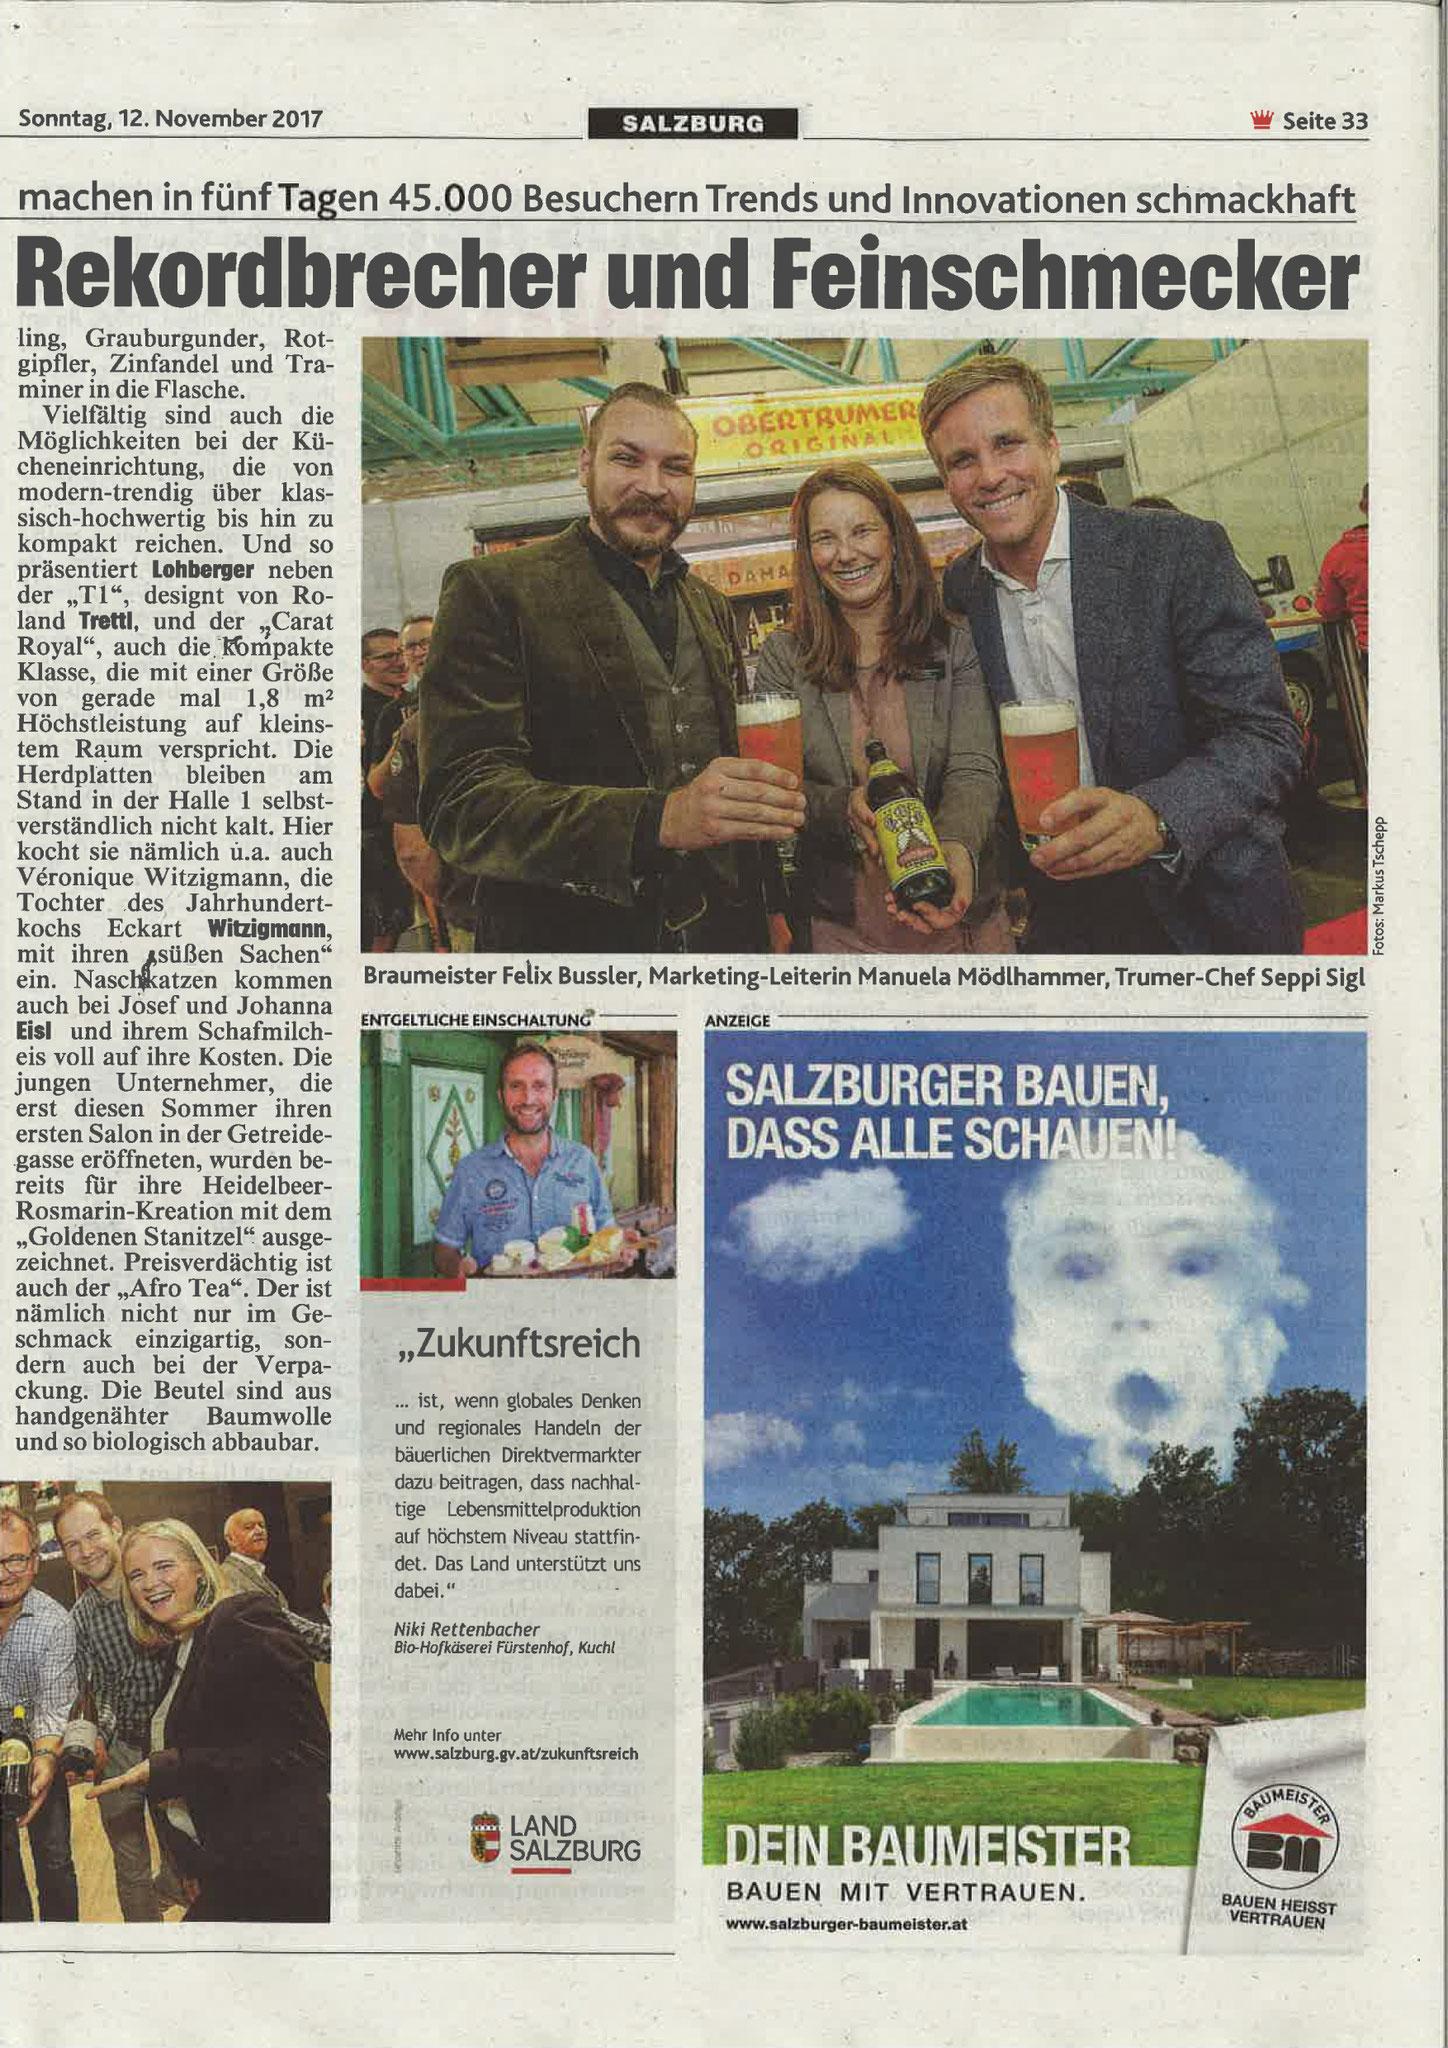 Kronen Zeitung, 12. November 2017